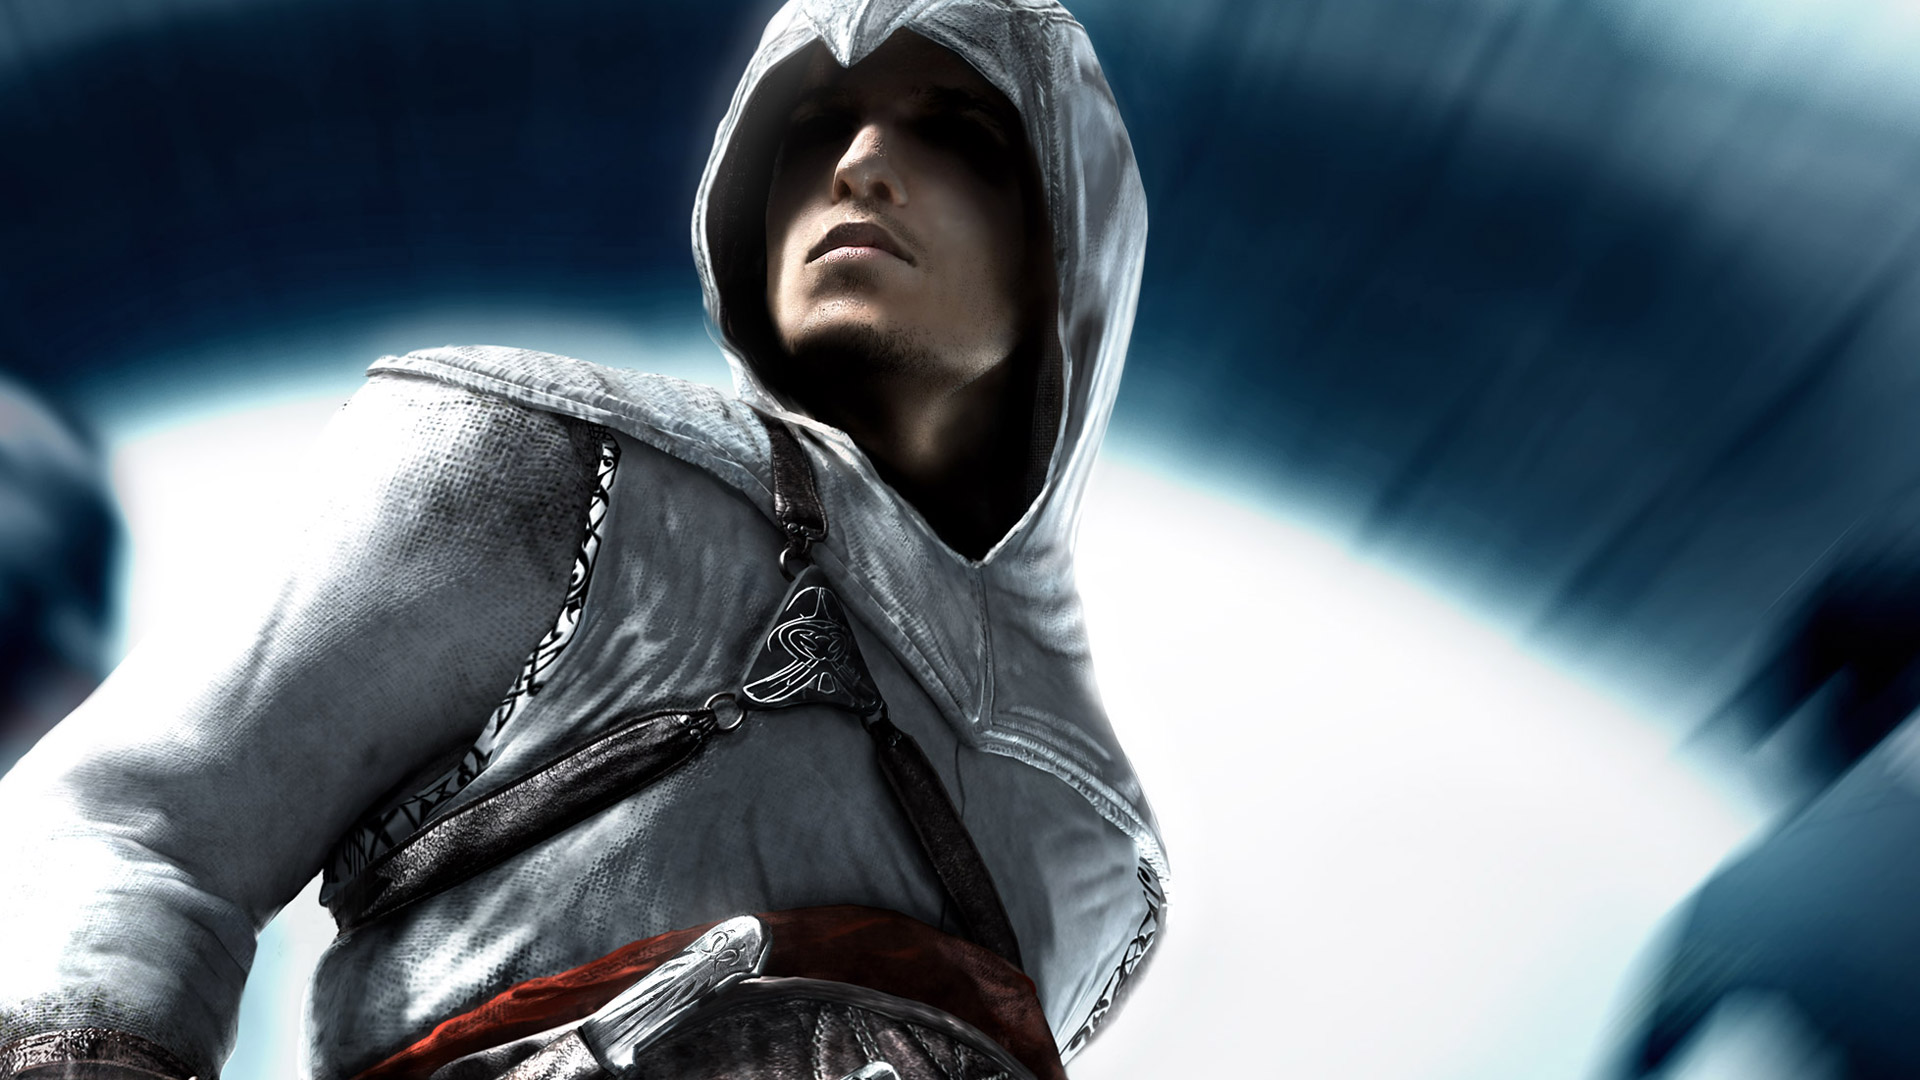 Assassins Creed wallpaper 14